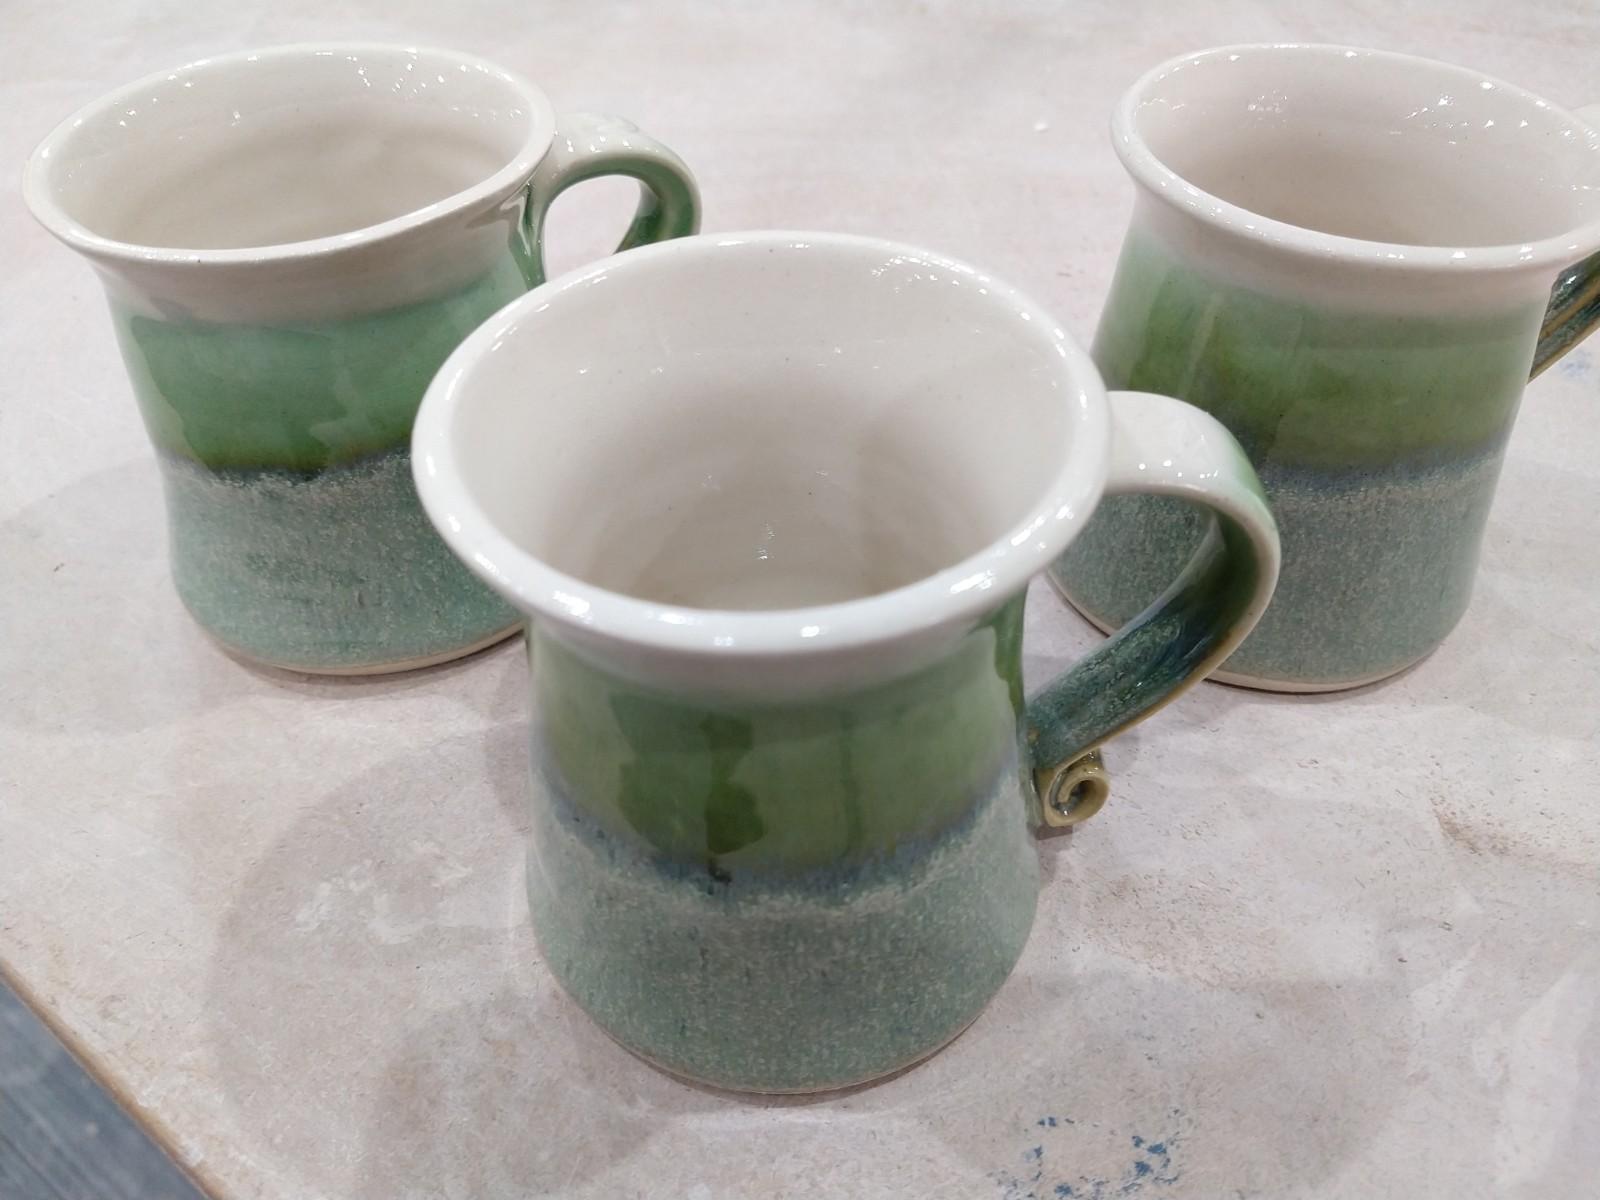 More mugs